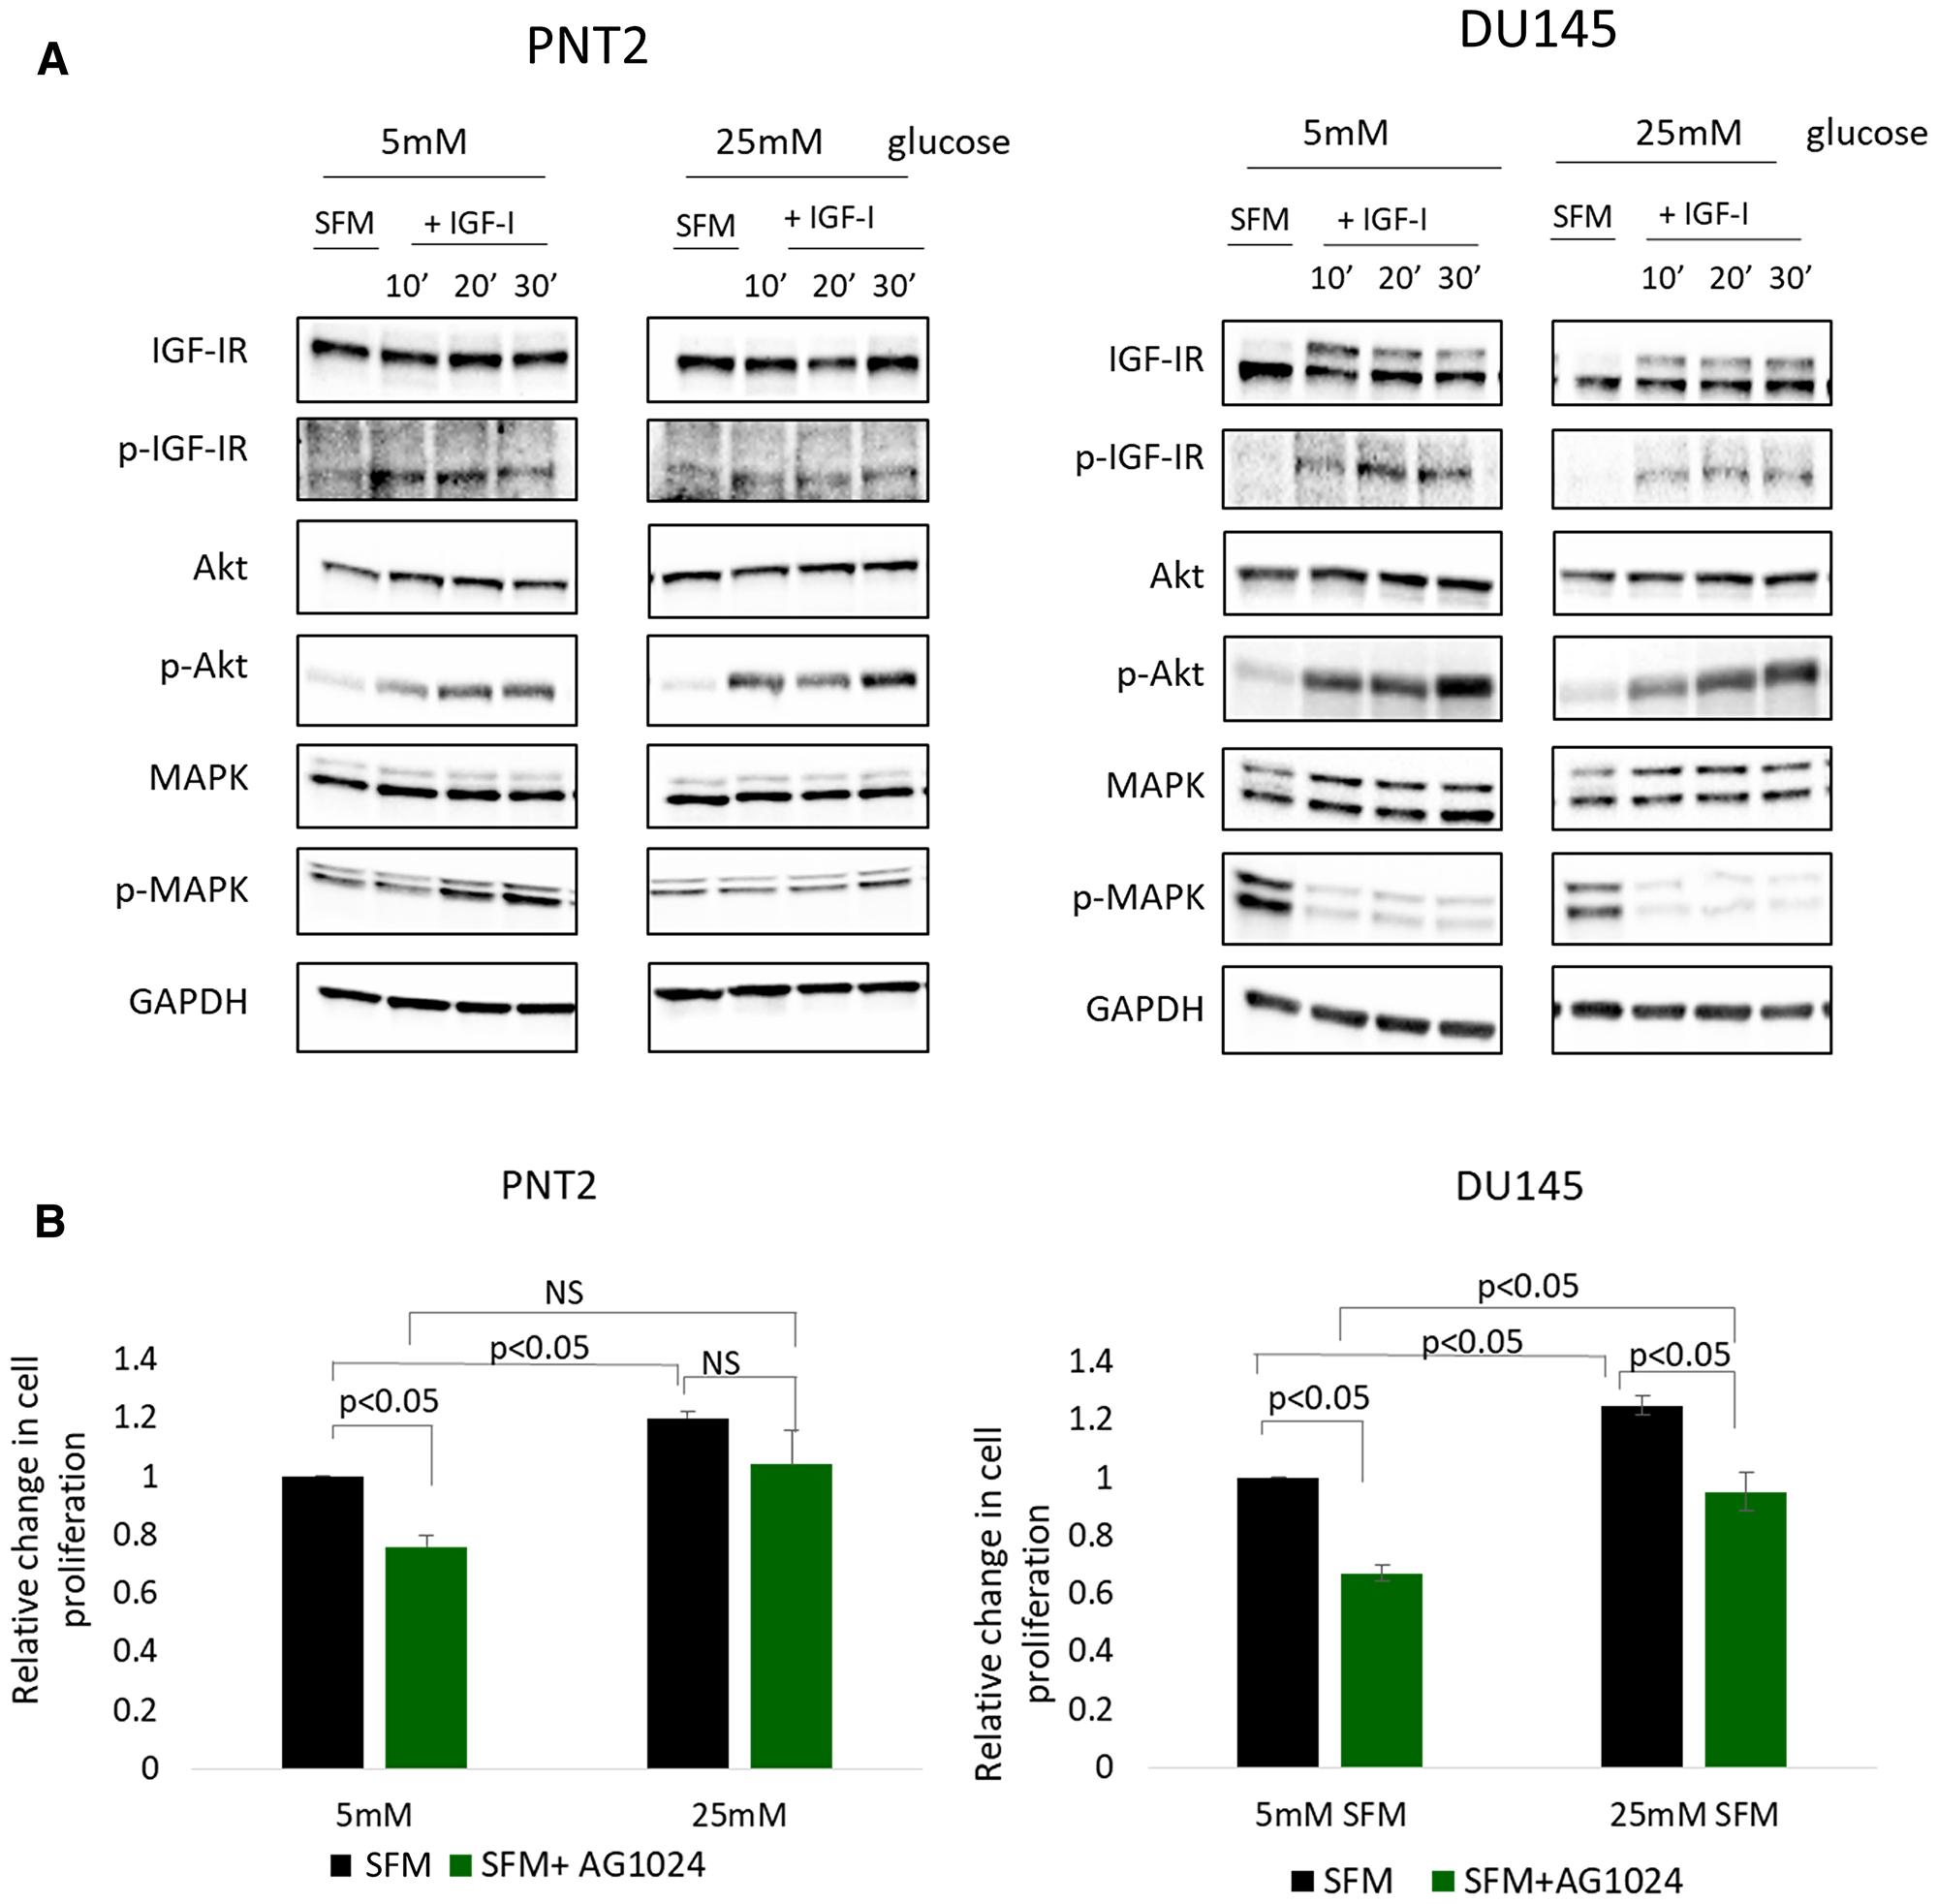 High glucose-induced EMT in prostate cells is independent of IGFI-R.